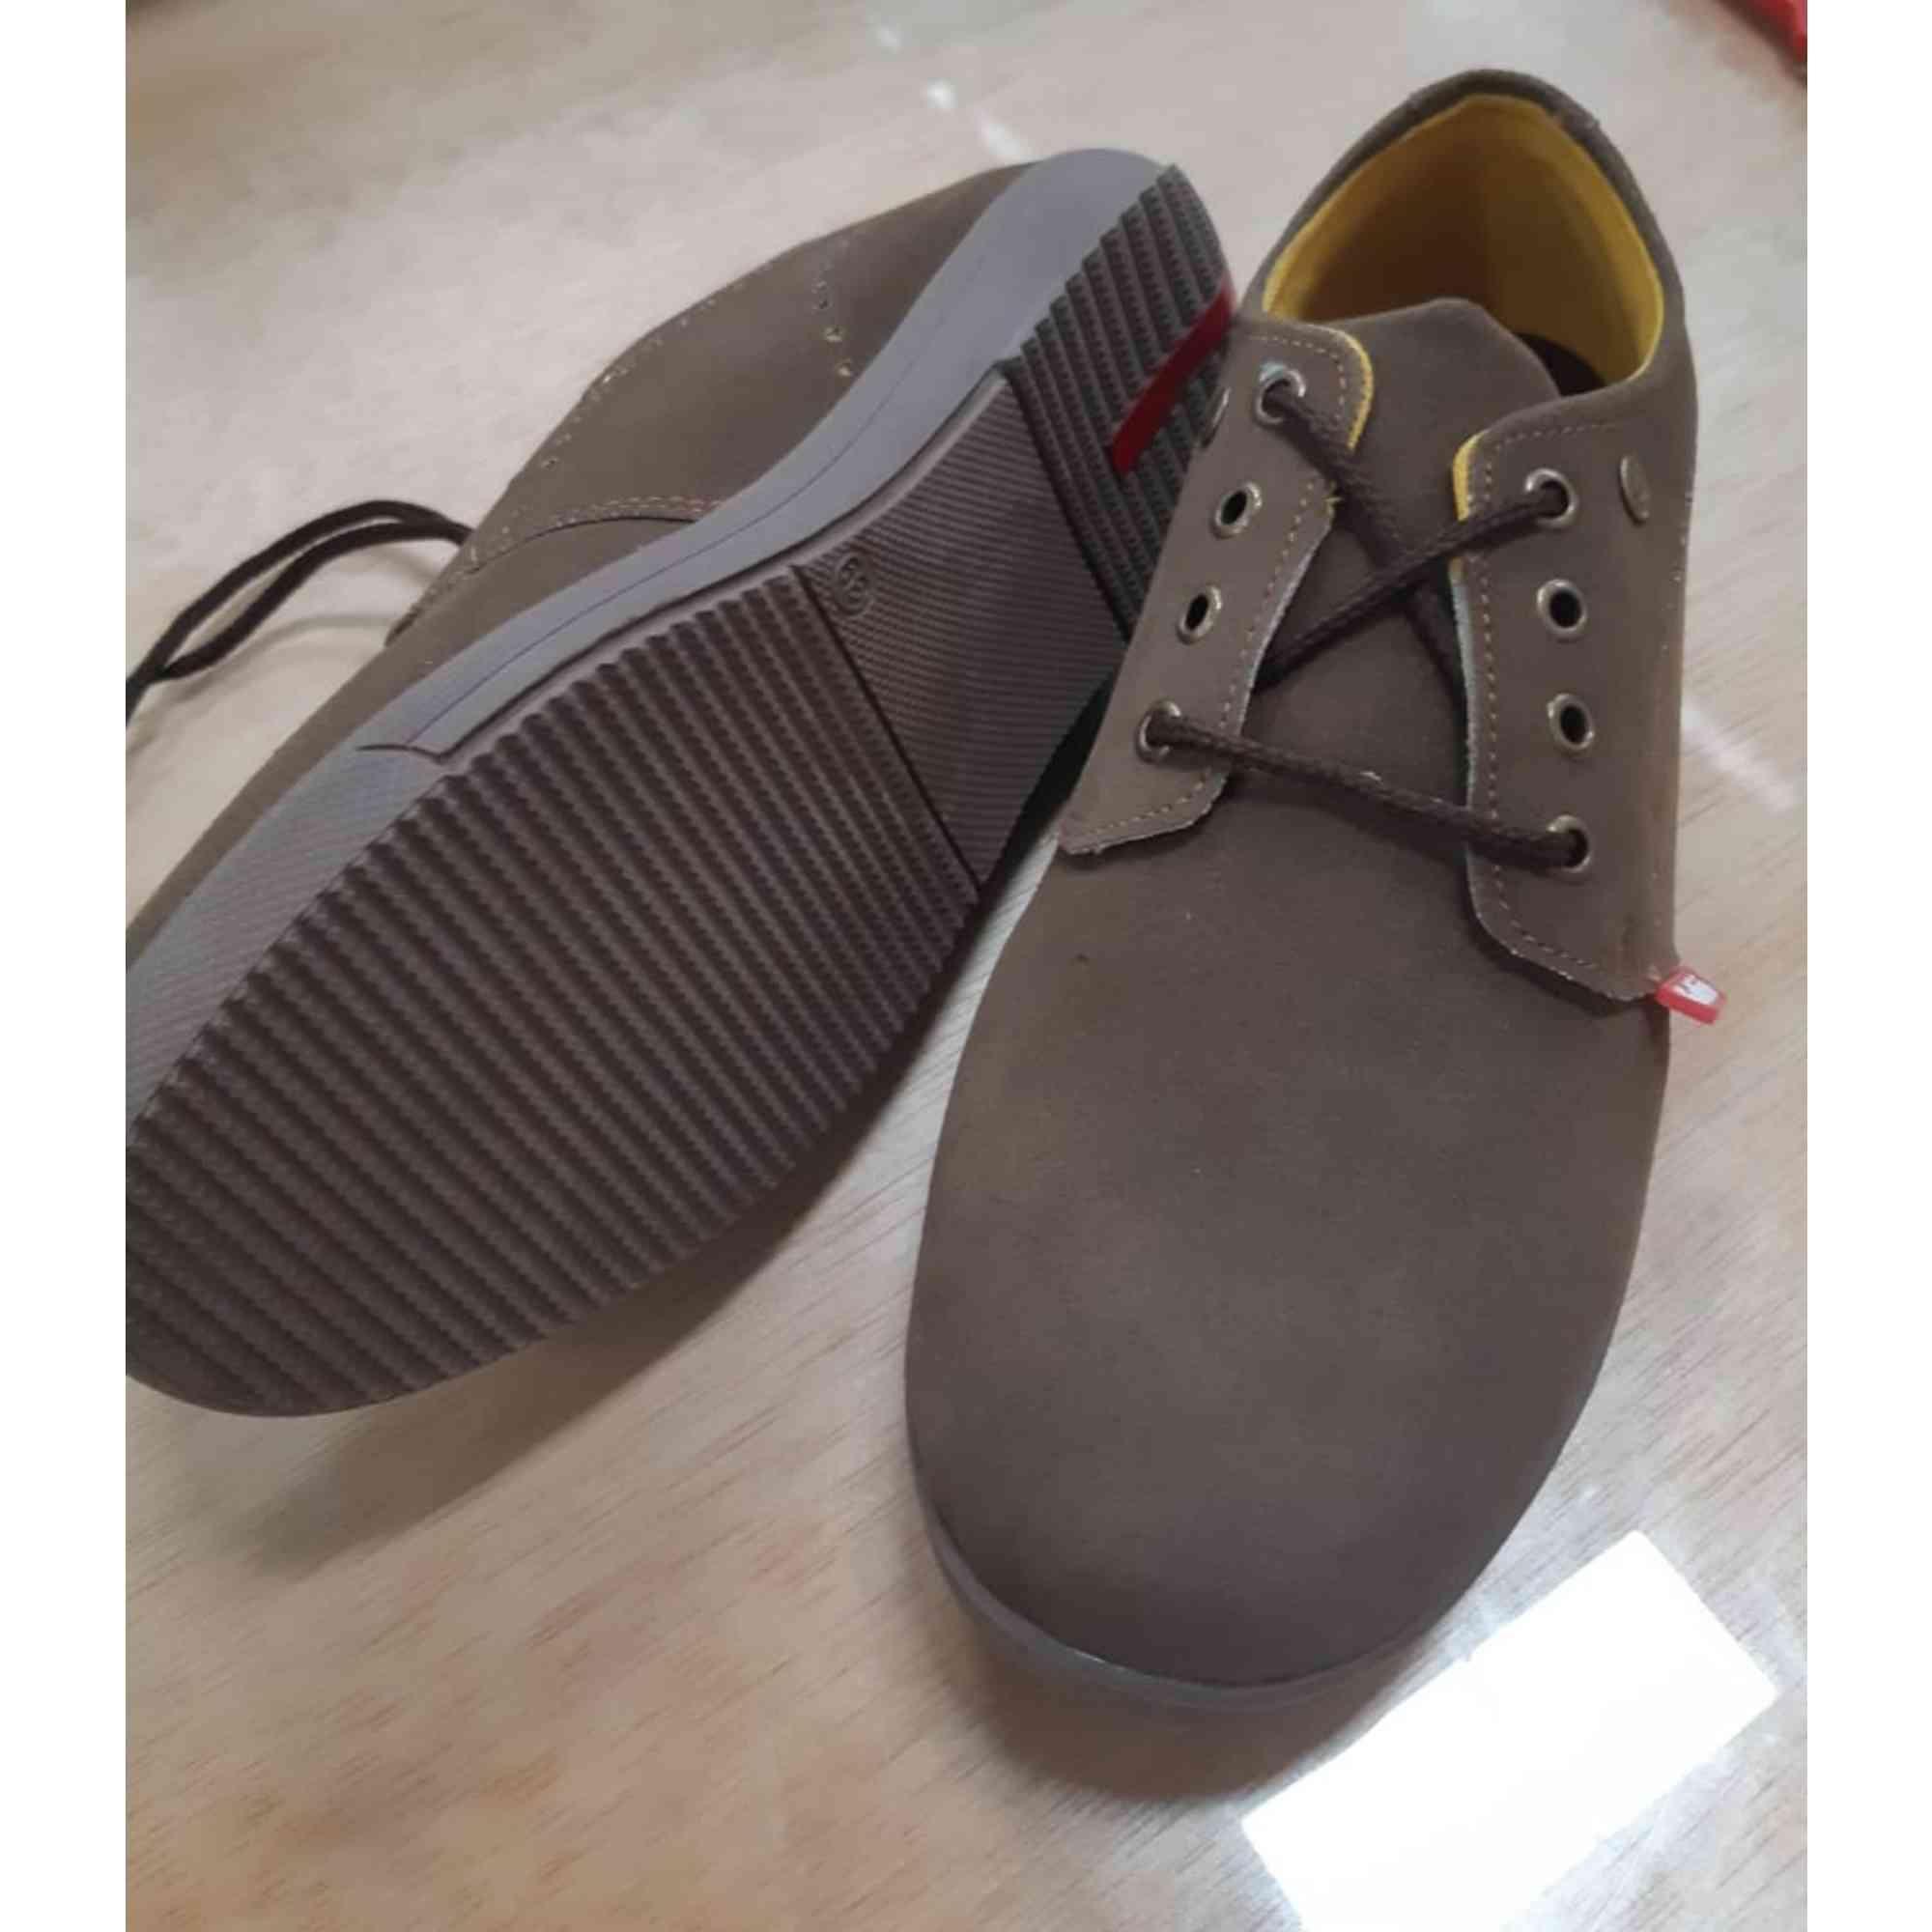 Garucci Gps 3065 Sandal Casual Pria Sintetis Stylish Elegan Chamel Gda 9070 Sepatu Anak Laki Keren Hitam Gatio Sneakers Santai